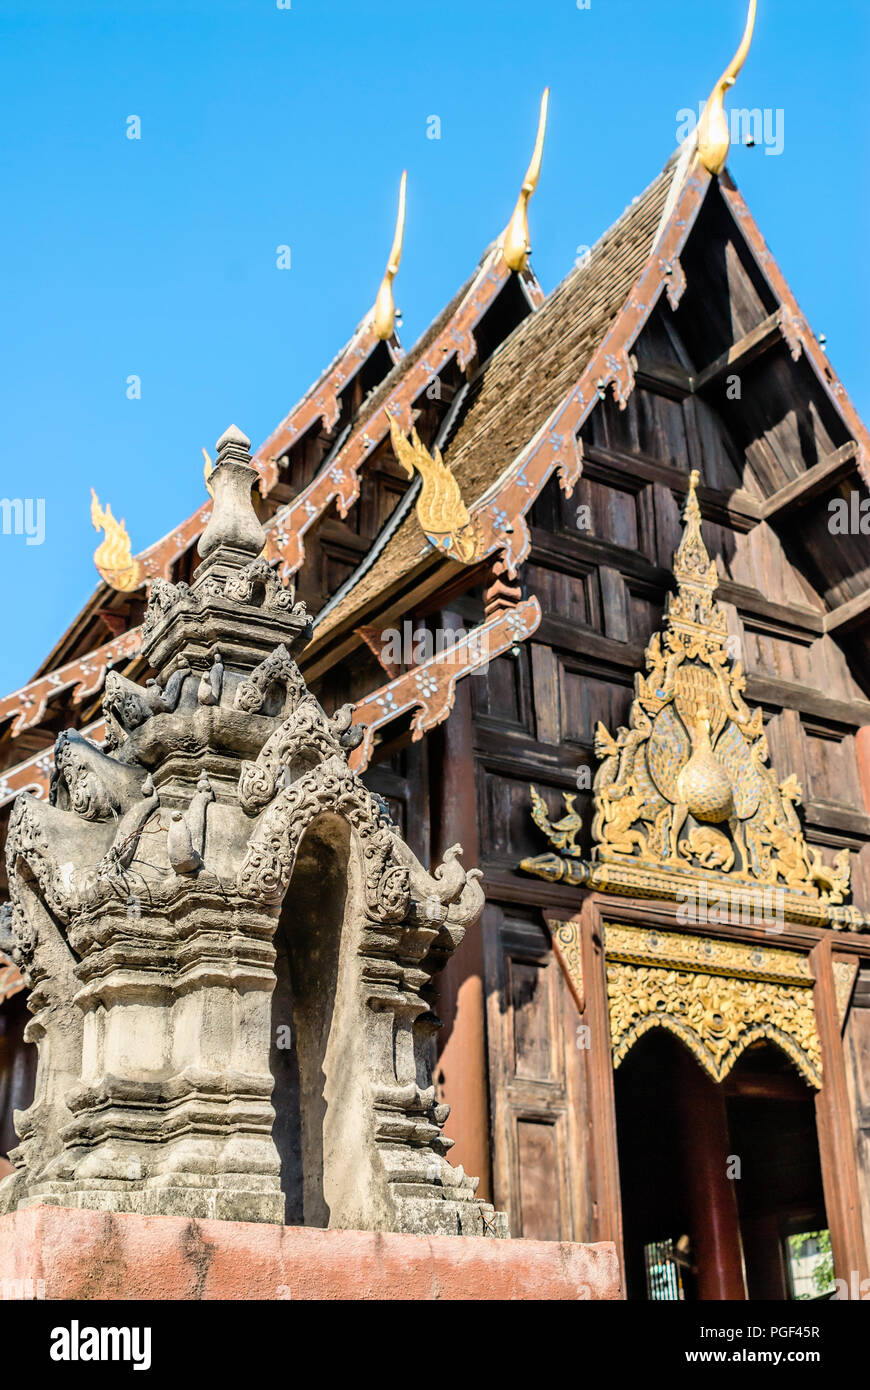 Wat Phant Tao, Chiang Mai, Northern Thailand | Wat Phant ao, Chiang  Mai, Nordthailand - Stock Image